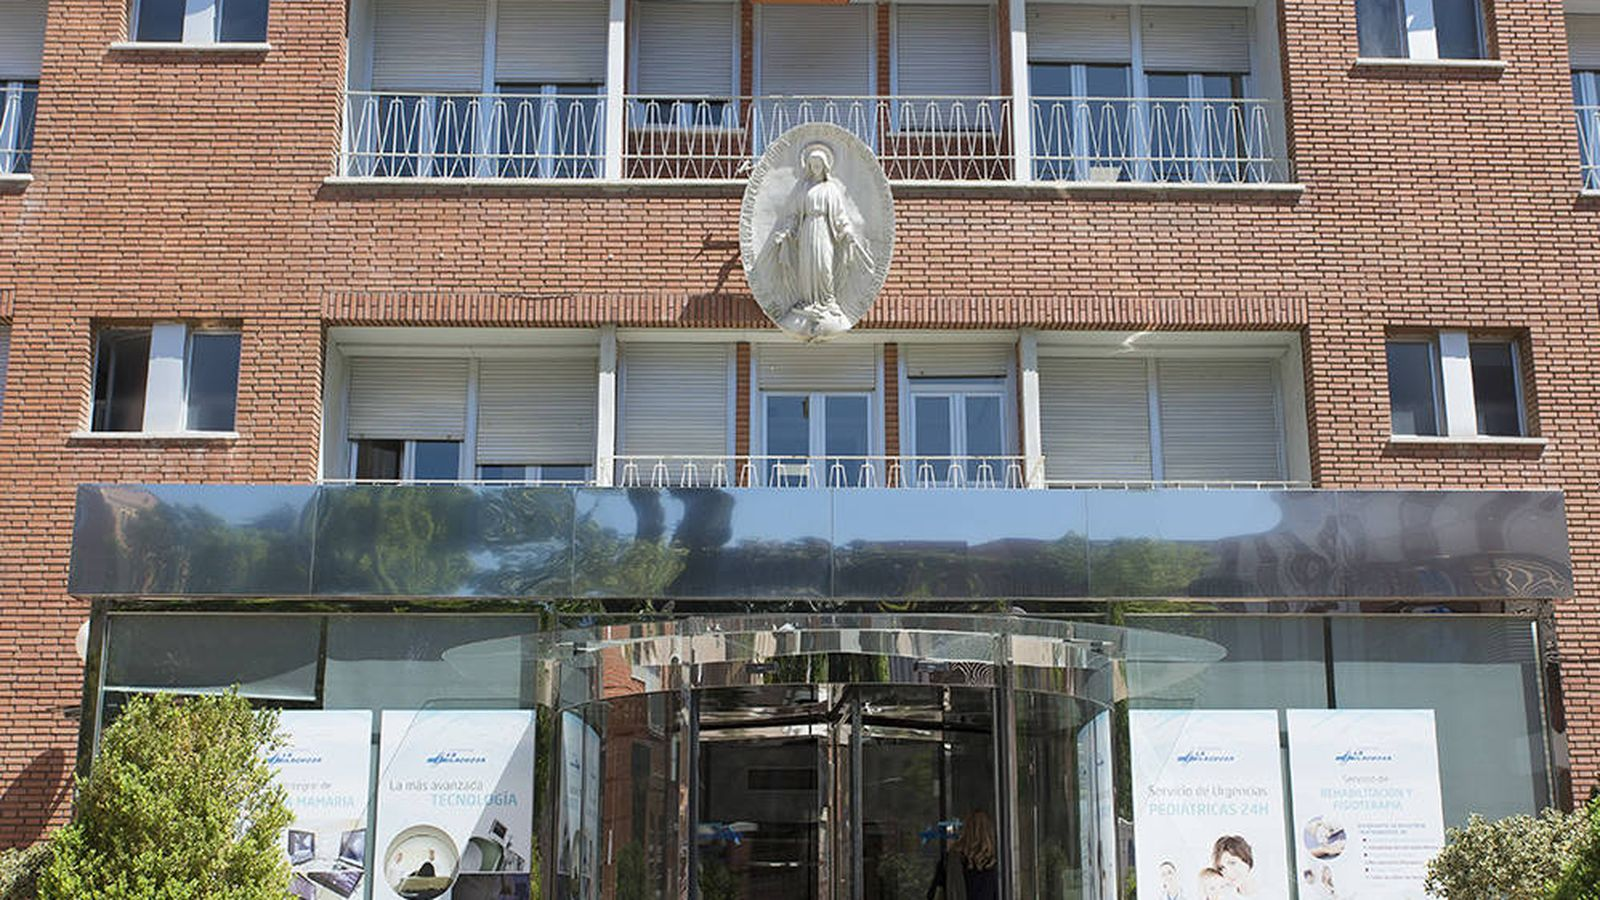 Foto: Hospital La Milagrosa.